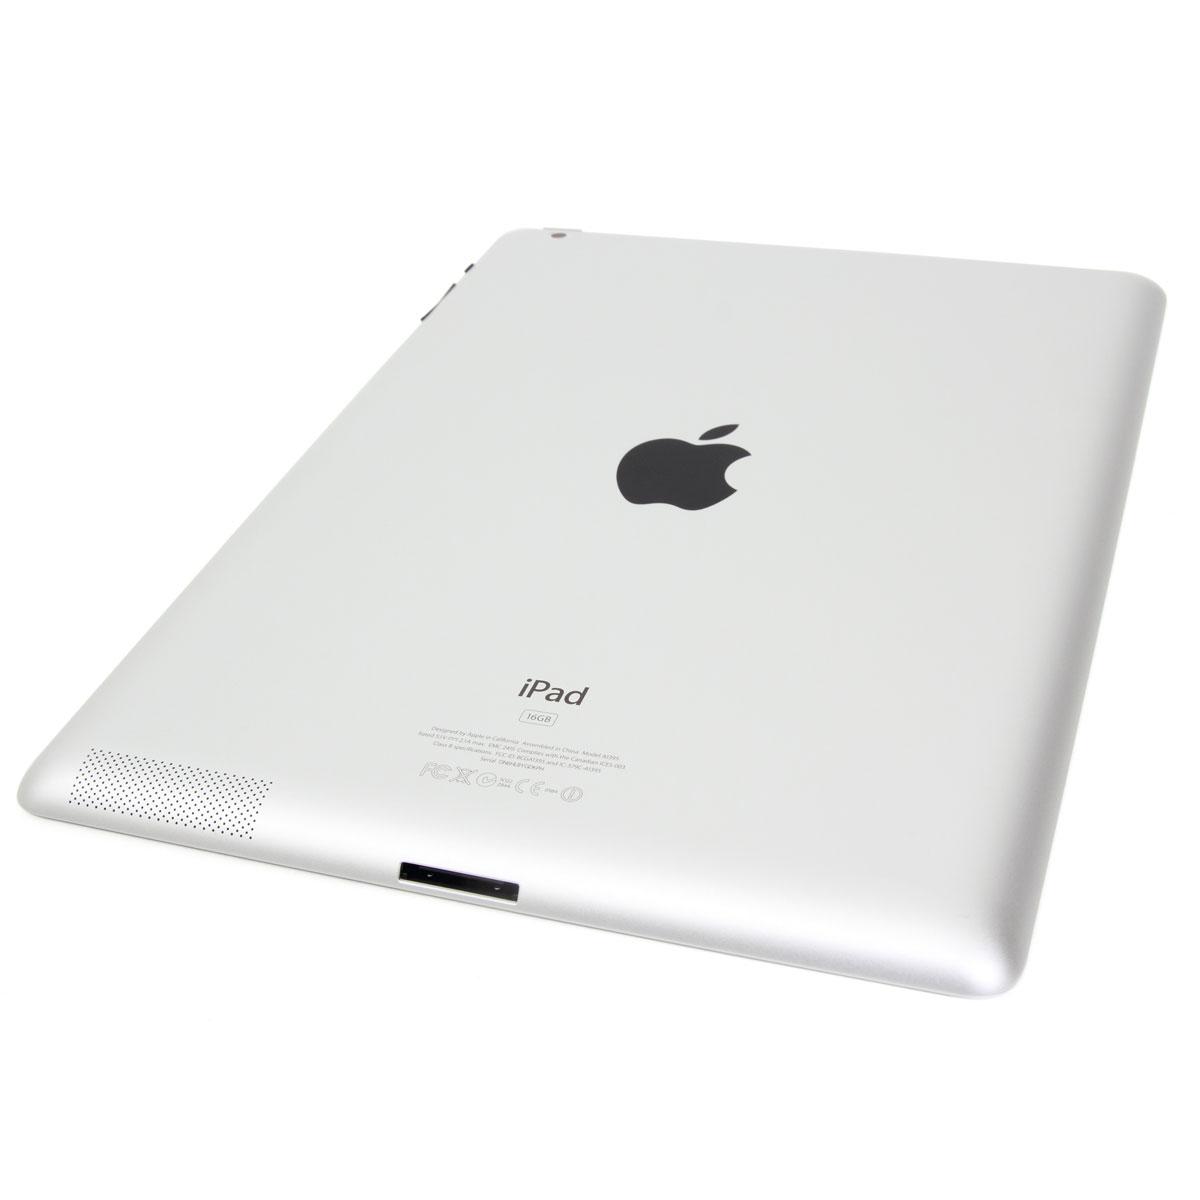 apple ipad 2 wi fi 3g 32 go blanc tablette tactile. Black Bedroom Furniture Sets. Home Design Ideas